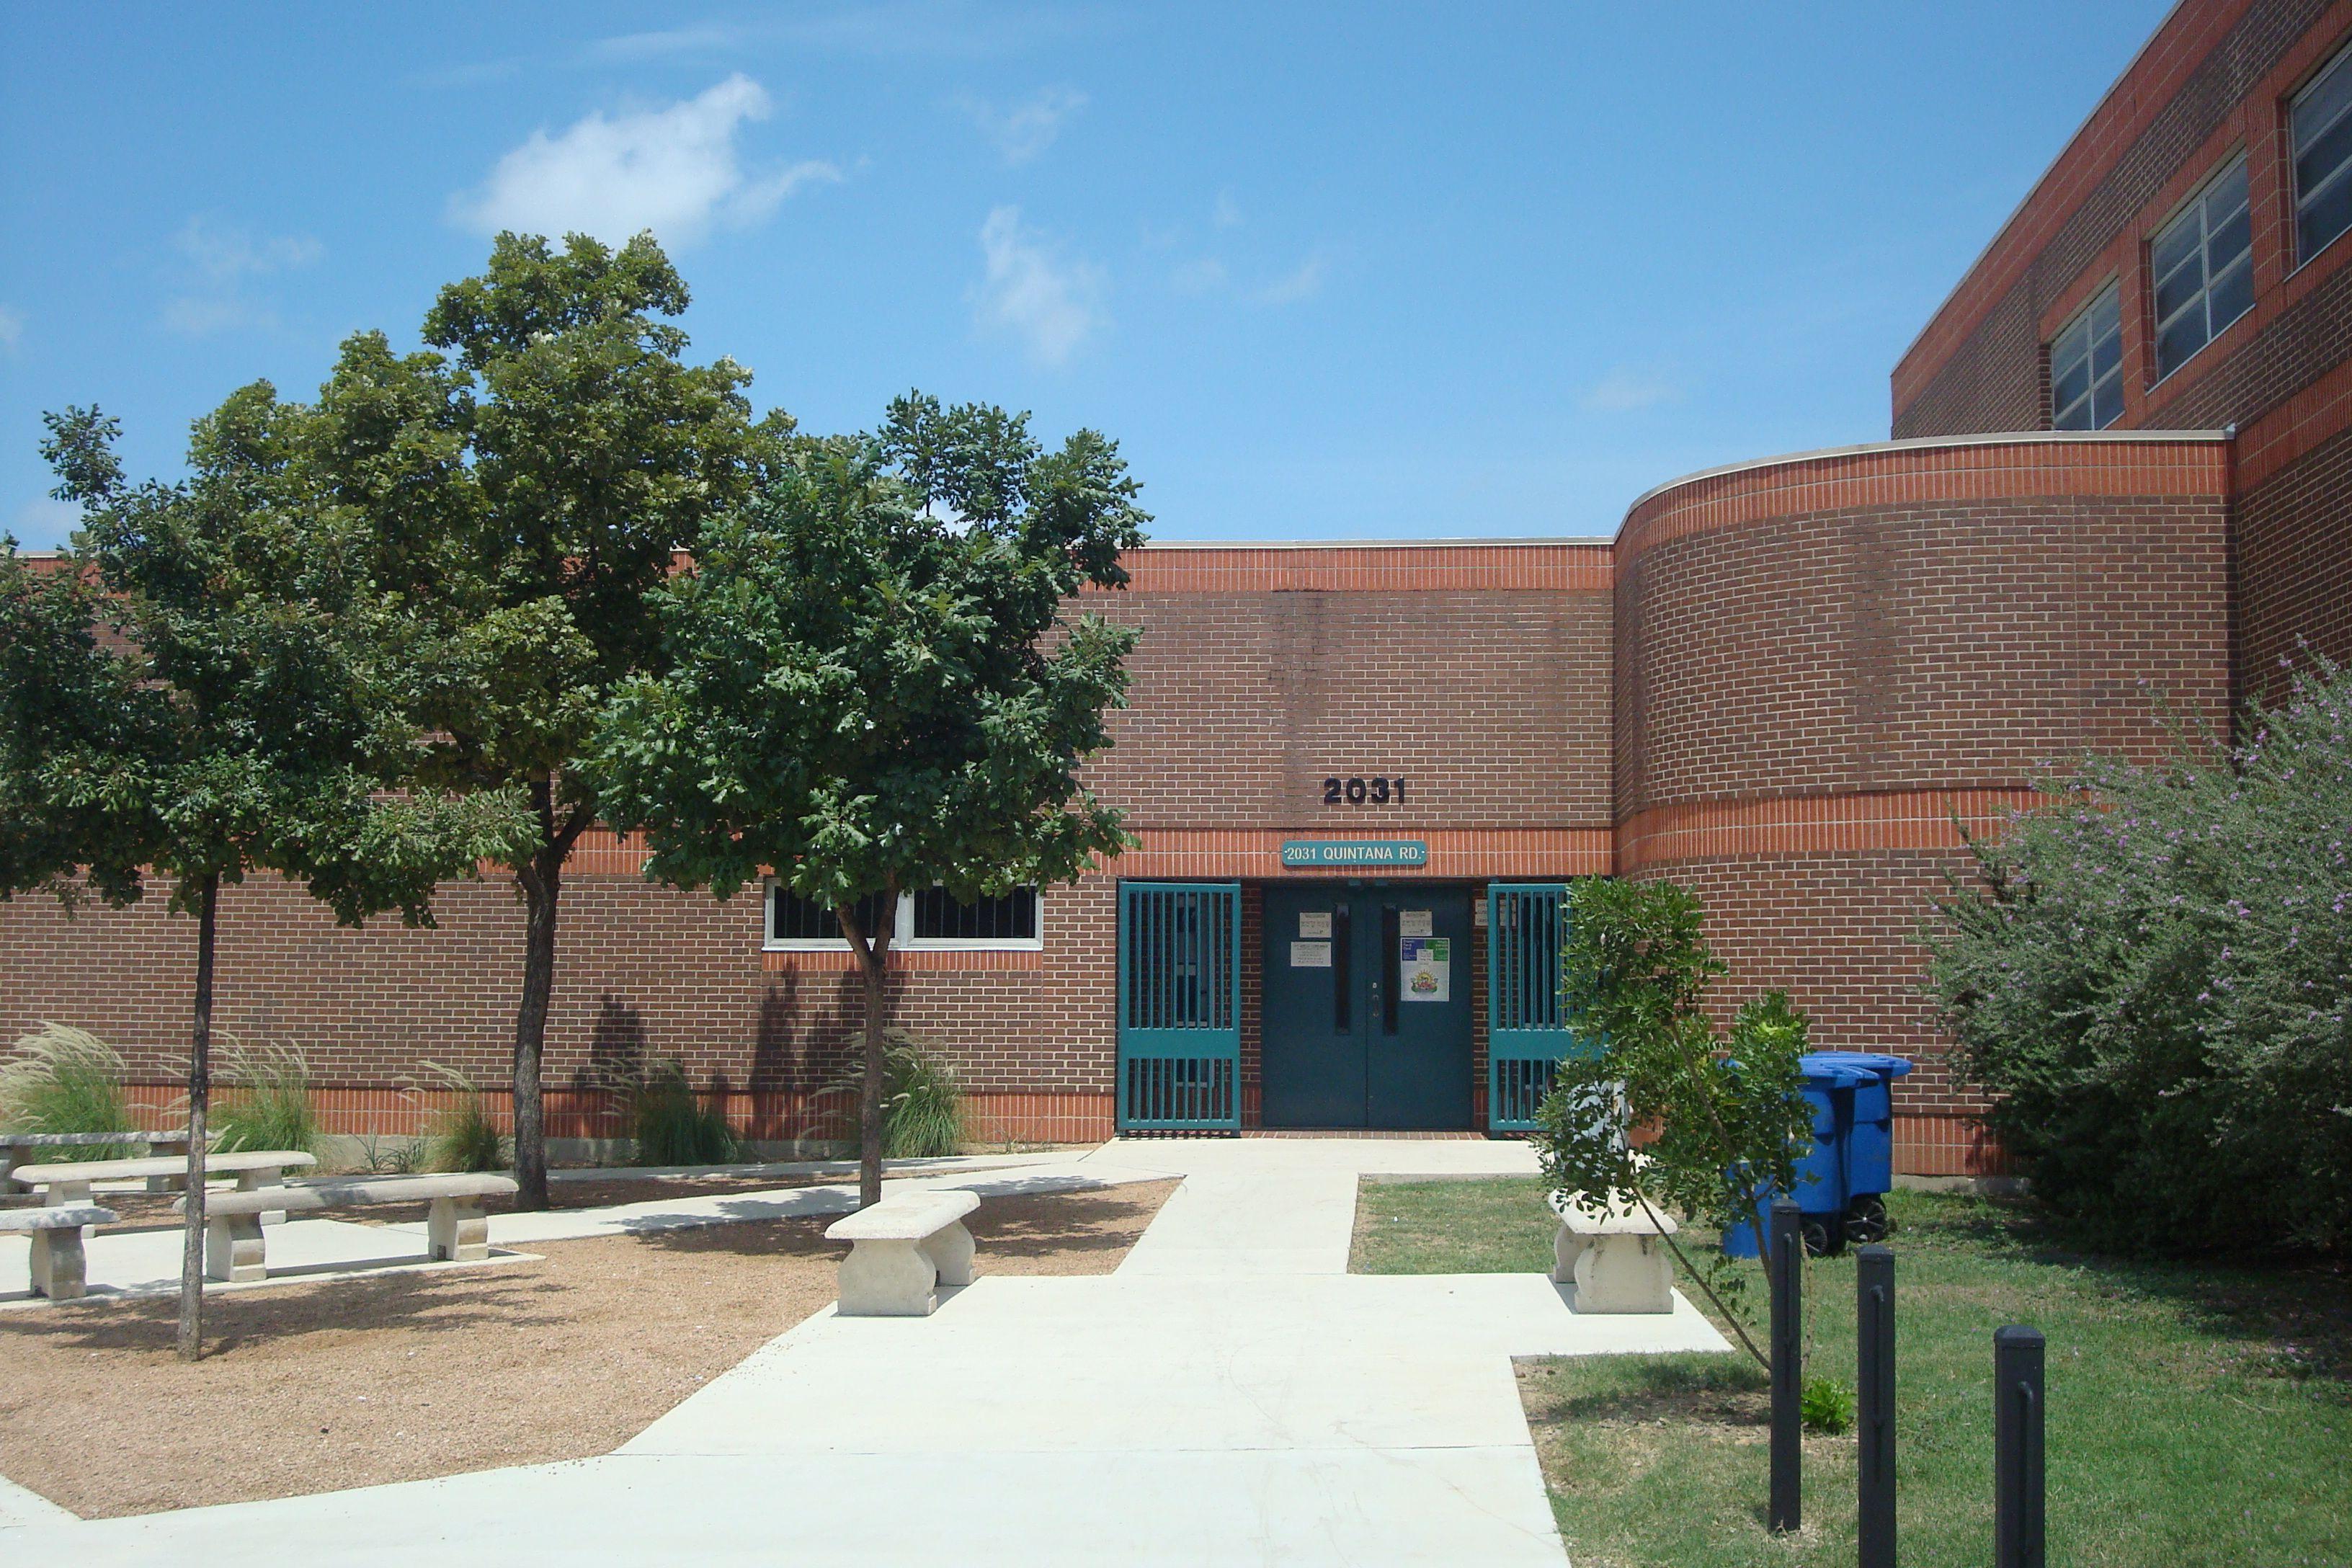 South San Community Center The City Of San Antonio